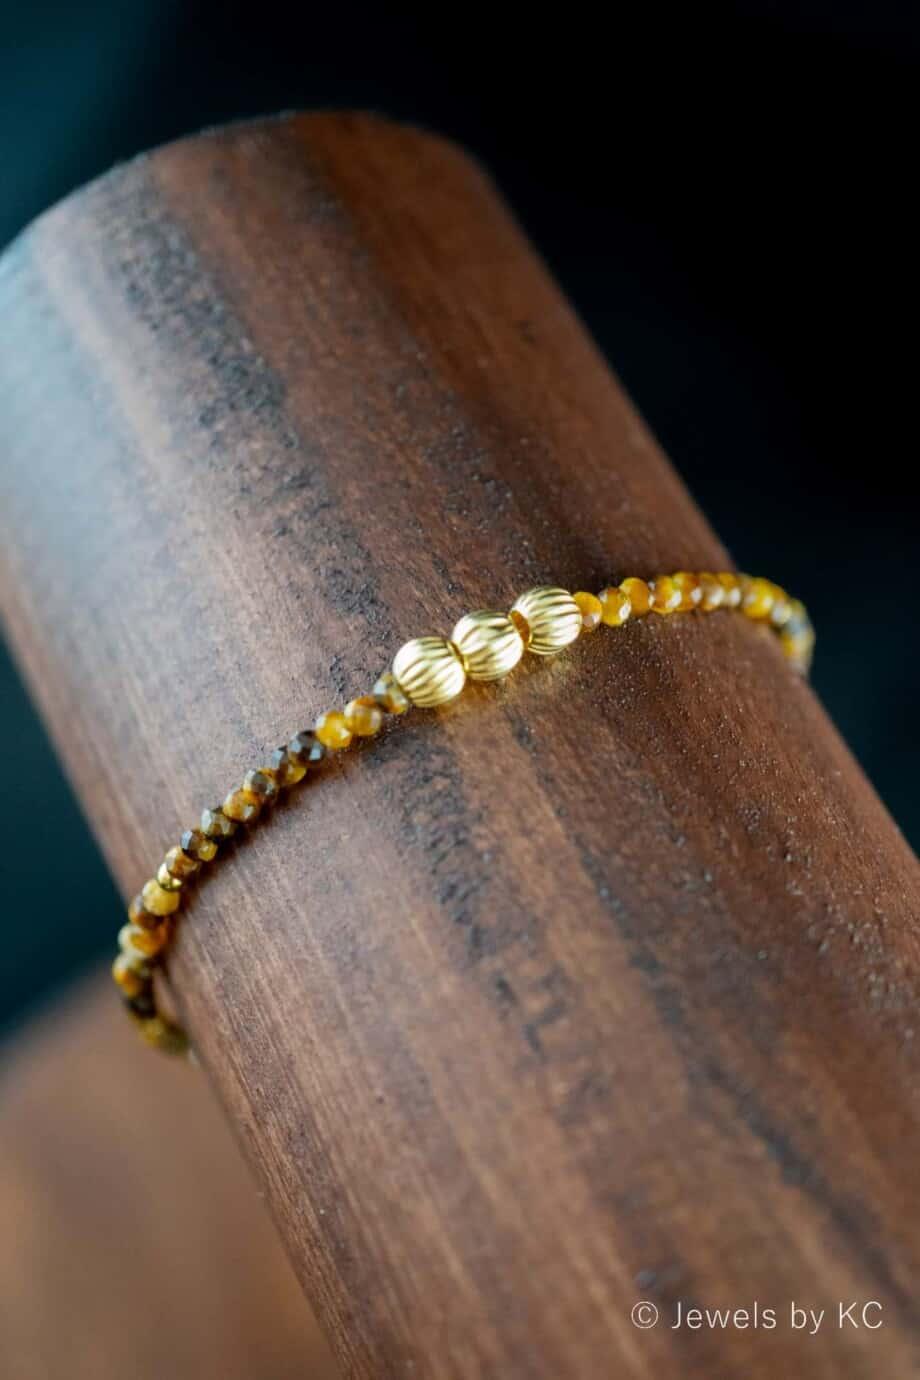 Handgemaakte Gouden edelsteen Armband 'The eye of the tiger'